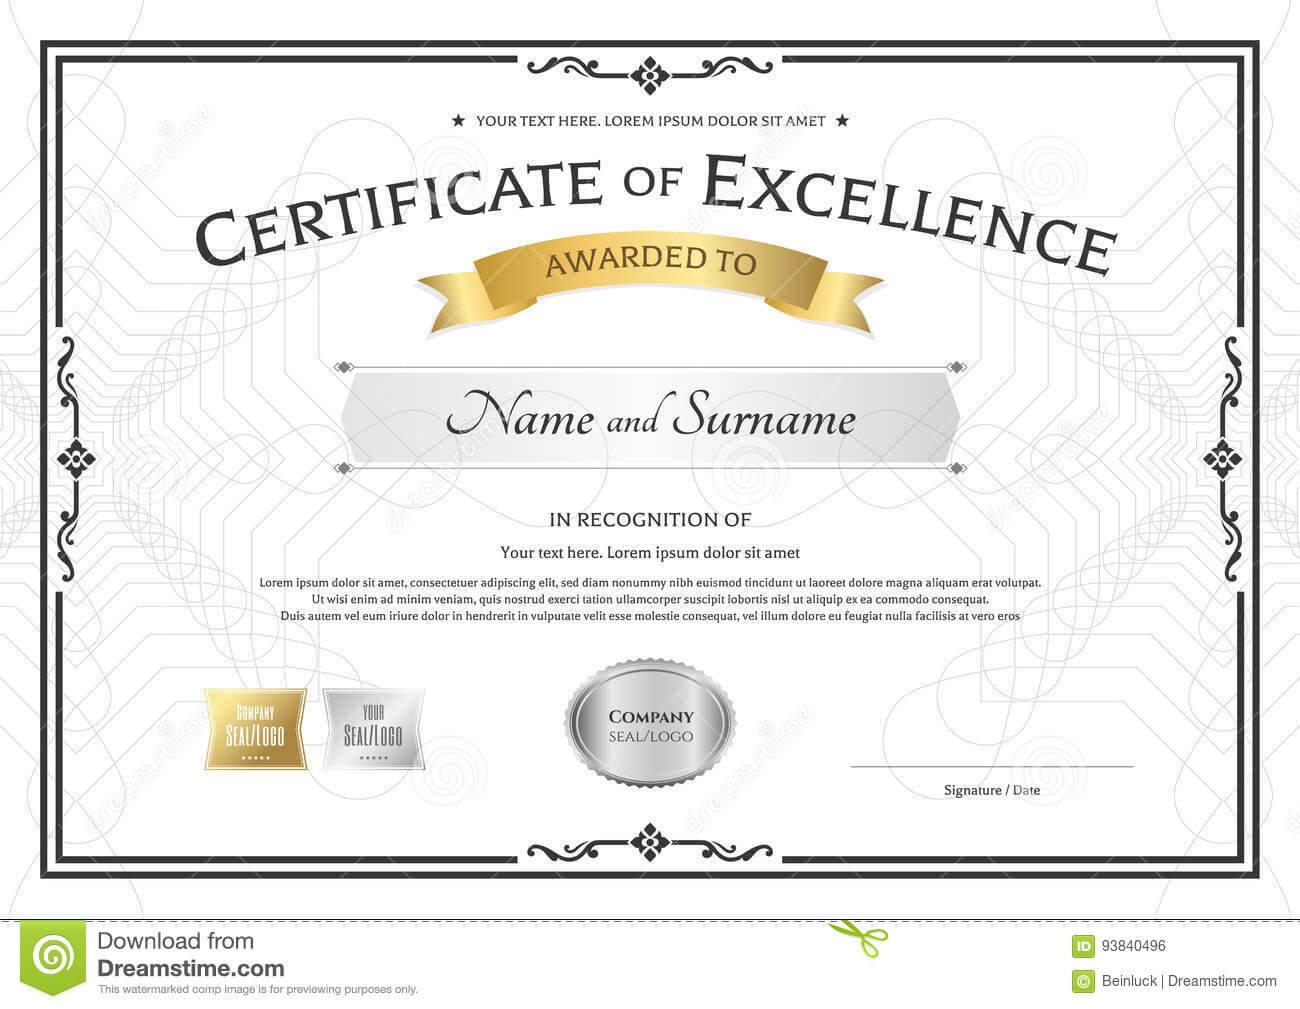 certificate excellence award template saving abs awards dalep midnightpig templates professional certificaat gouden schablone leistung zertifikat hervorragenden sybernews certificates printable